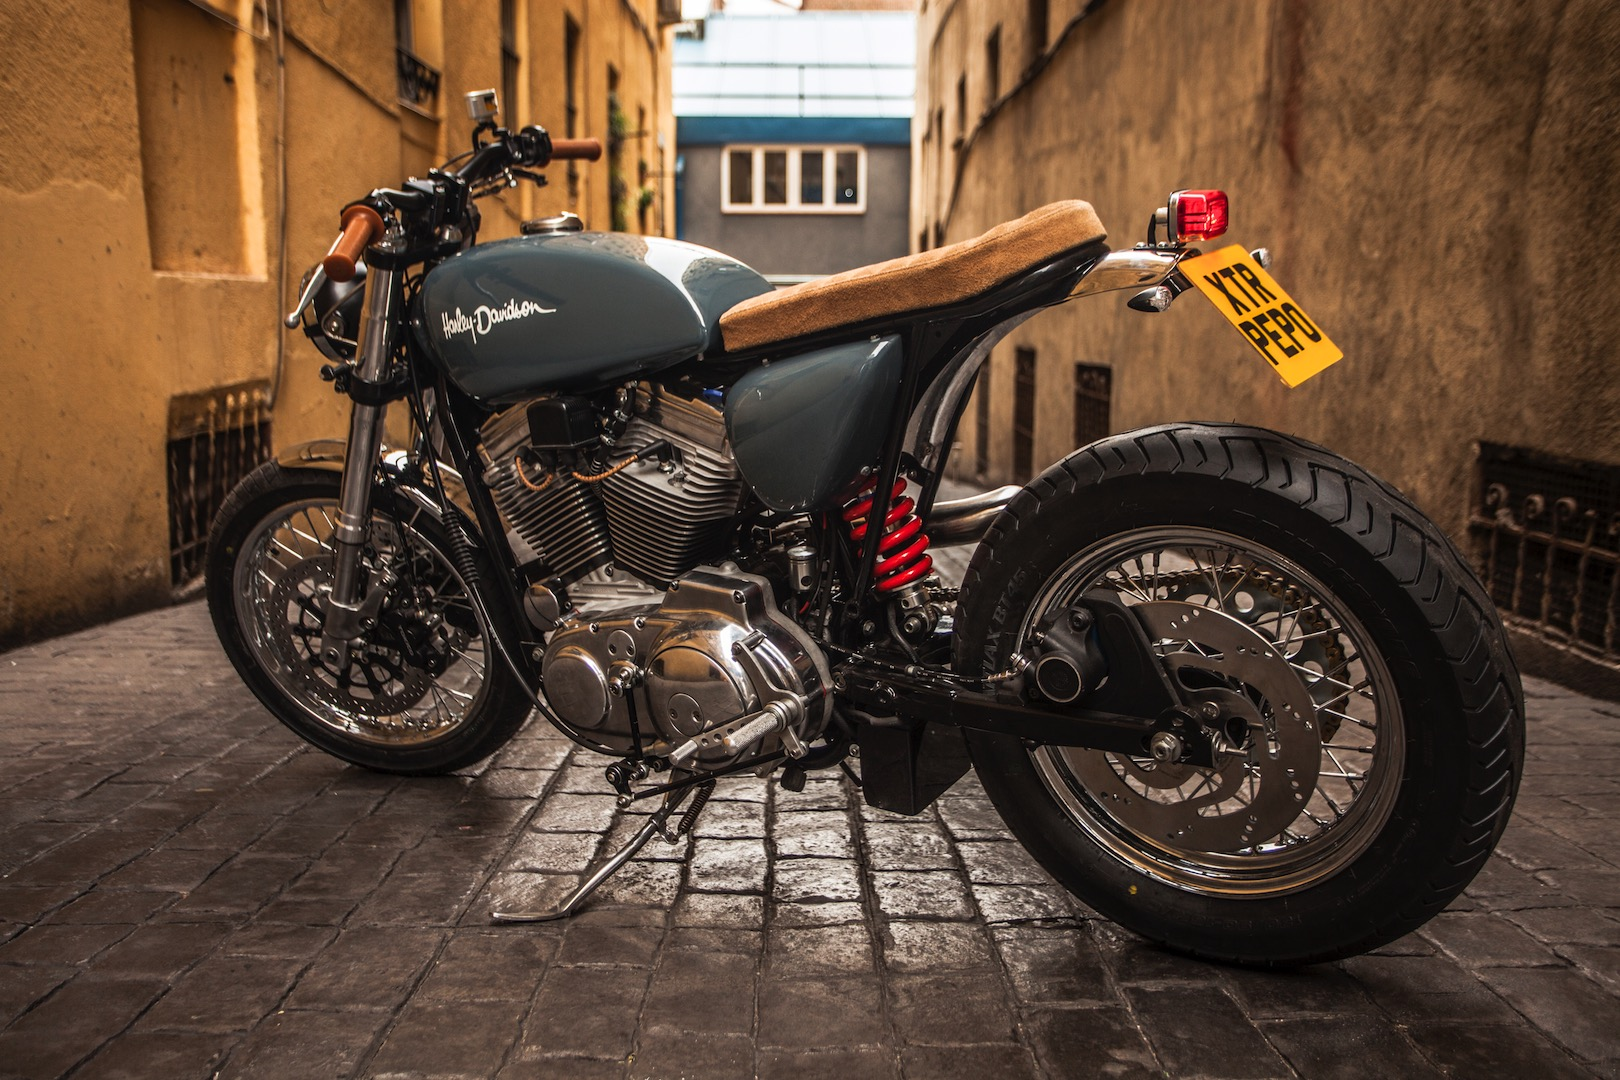 XTR Pepo gets handy with new custom 1992 Harley-Davidson XLH883